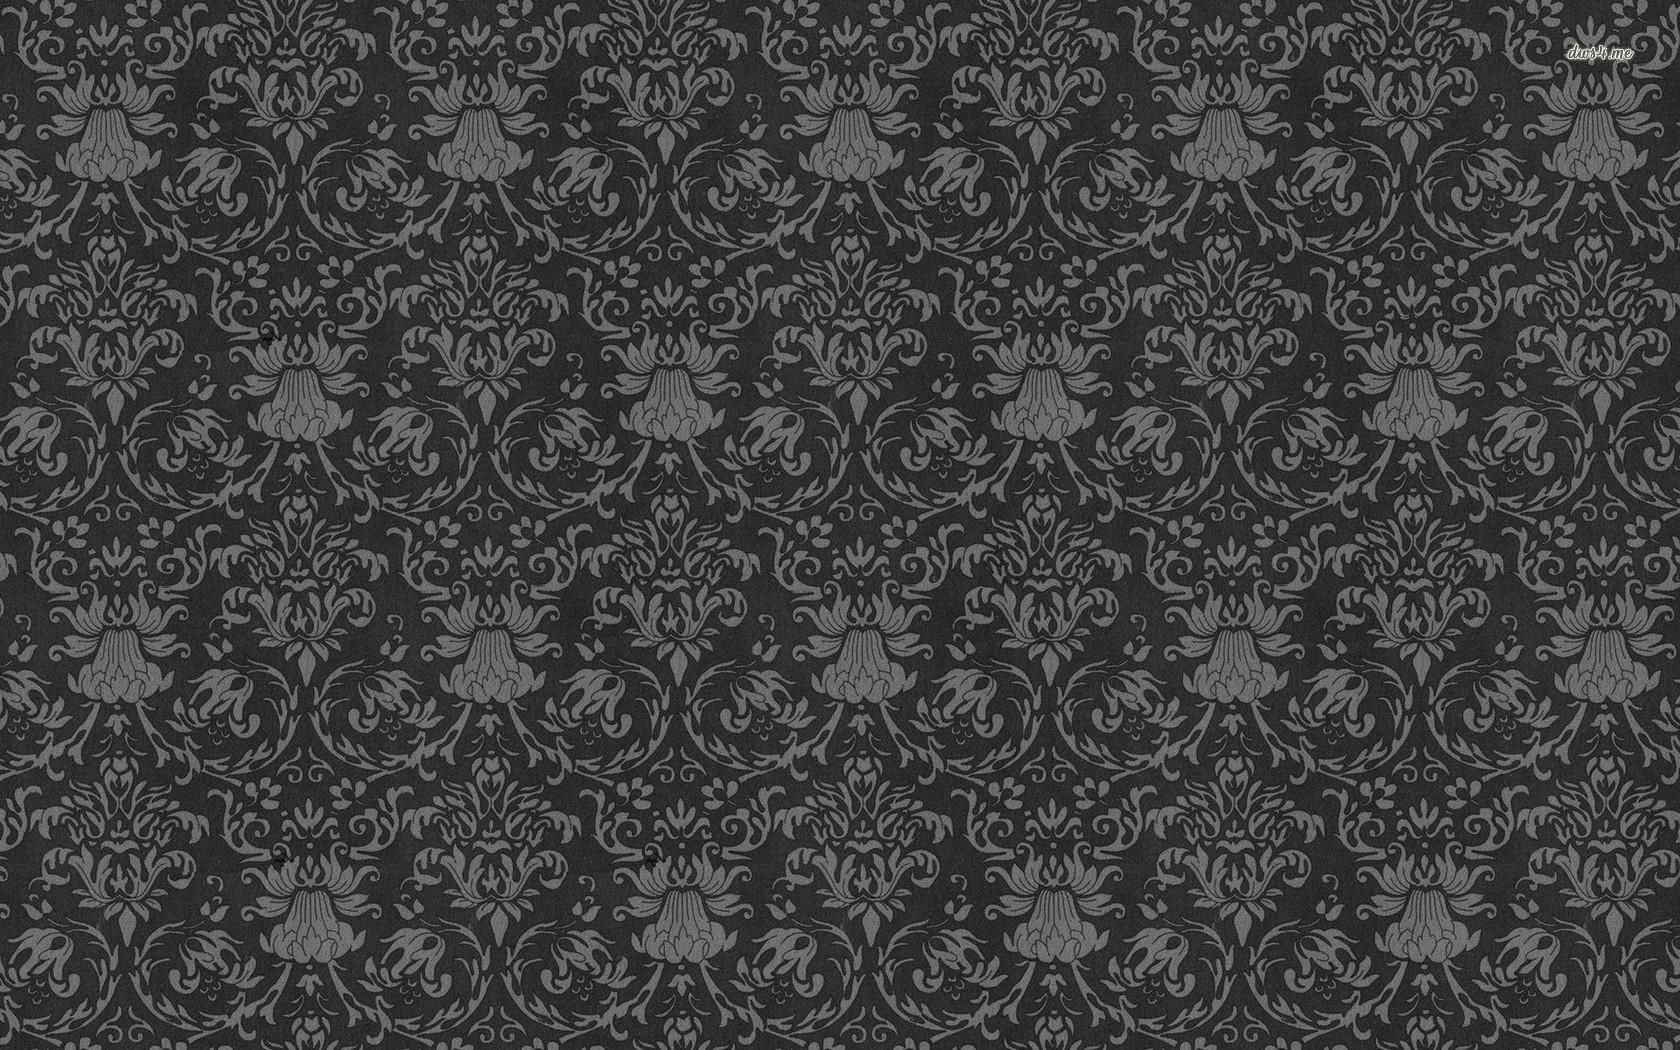 Vintage pattern 1680x1050